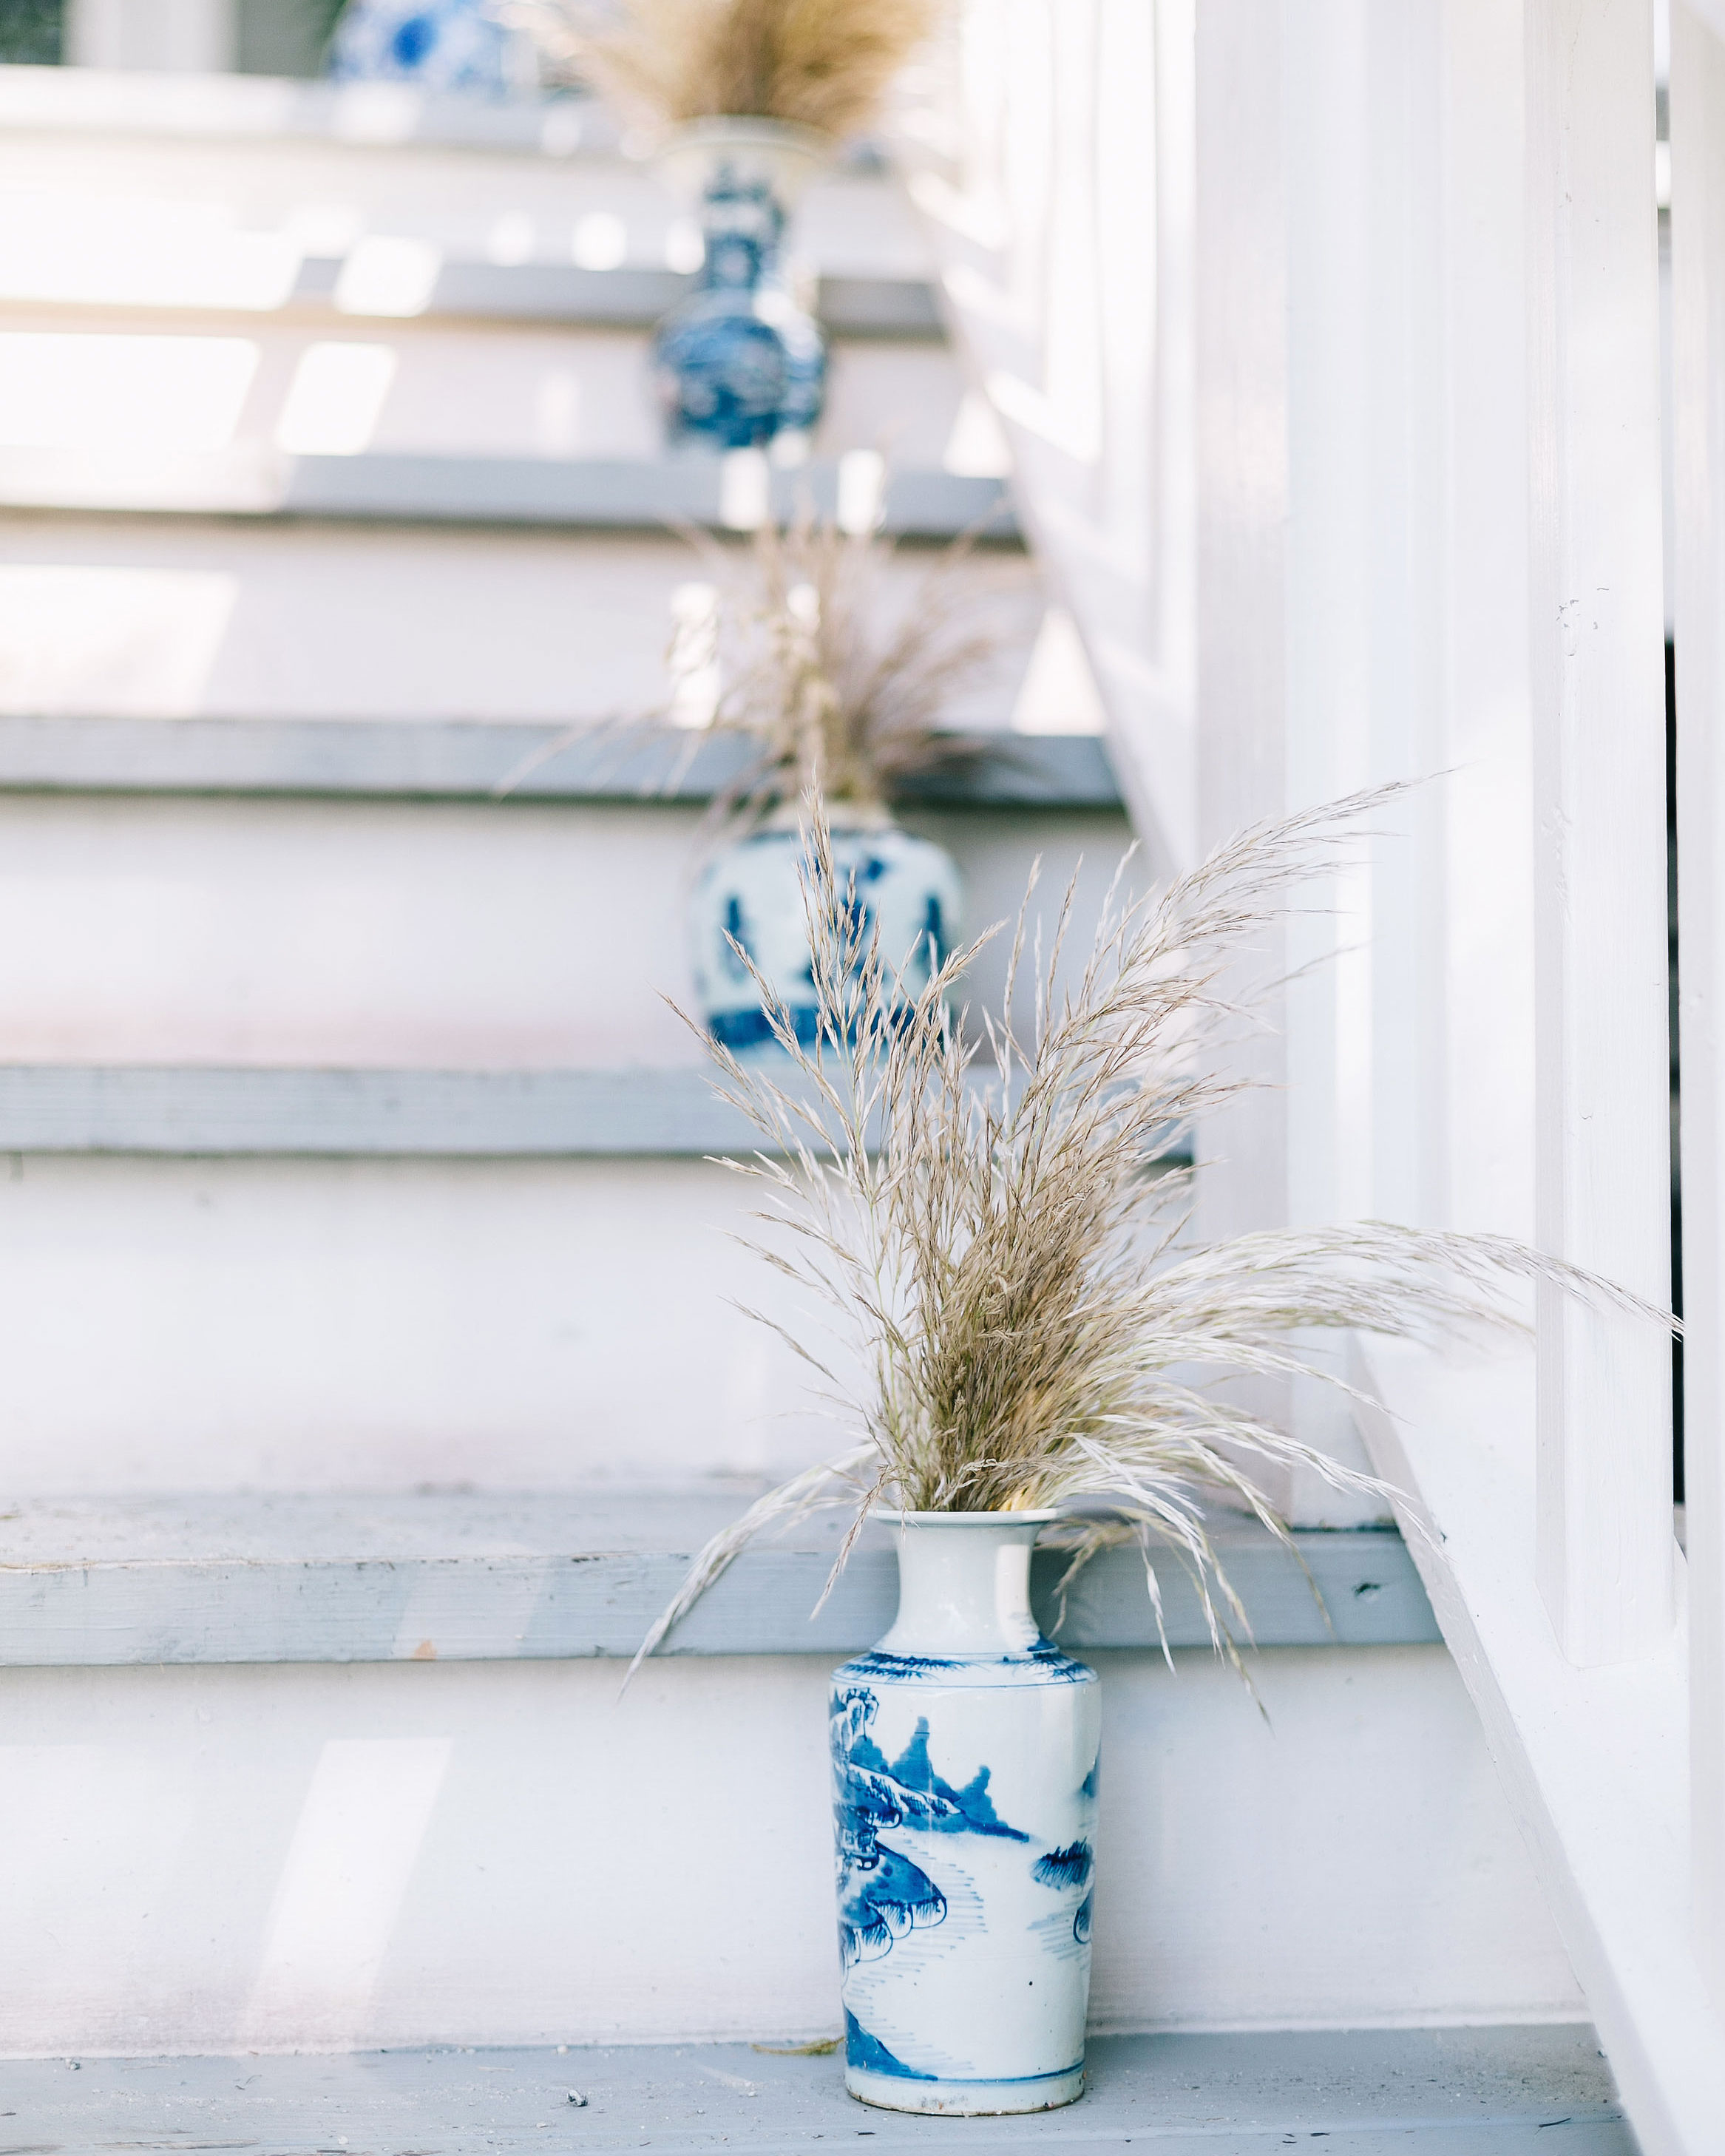 rachel-jurrie-nautical-wedding-stairs-0211-s112778-0416.jpg